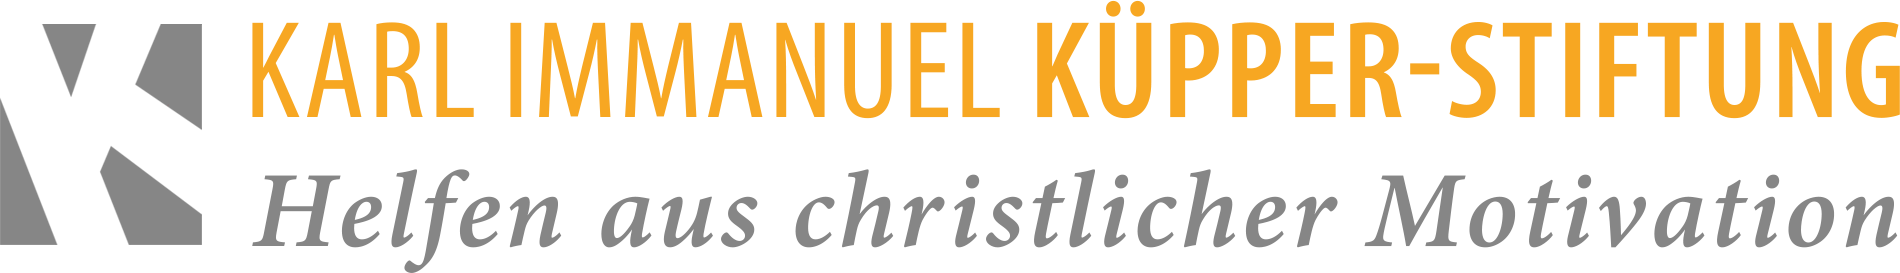 Logo Karl Immanuel Kuepper-Stiftung Koeln